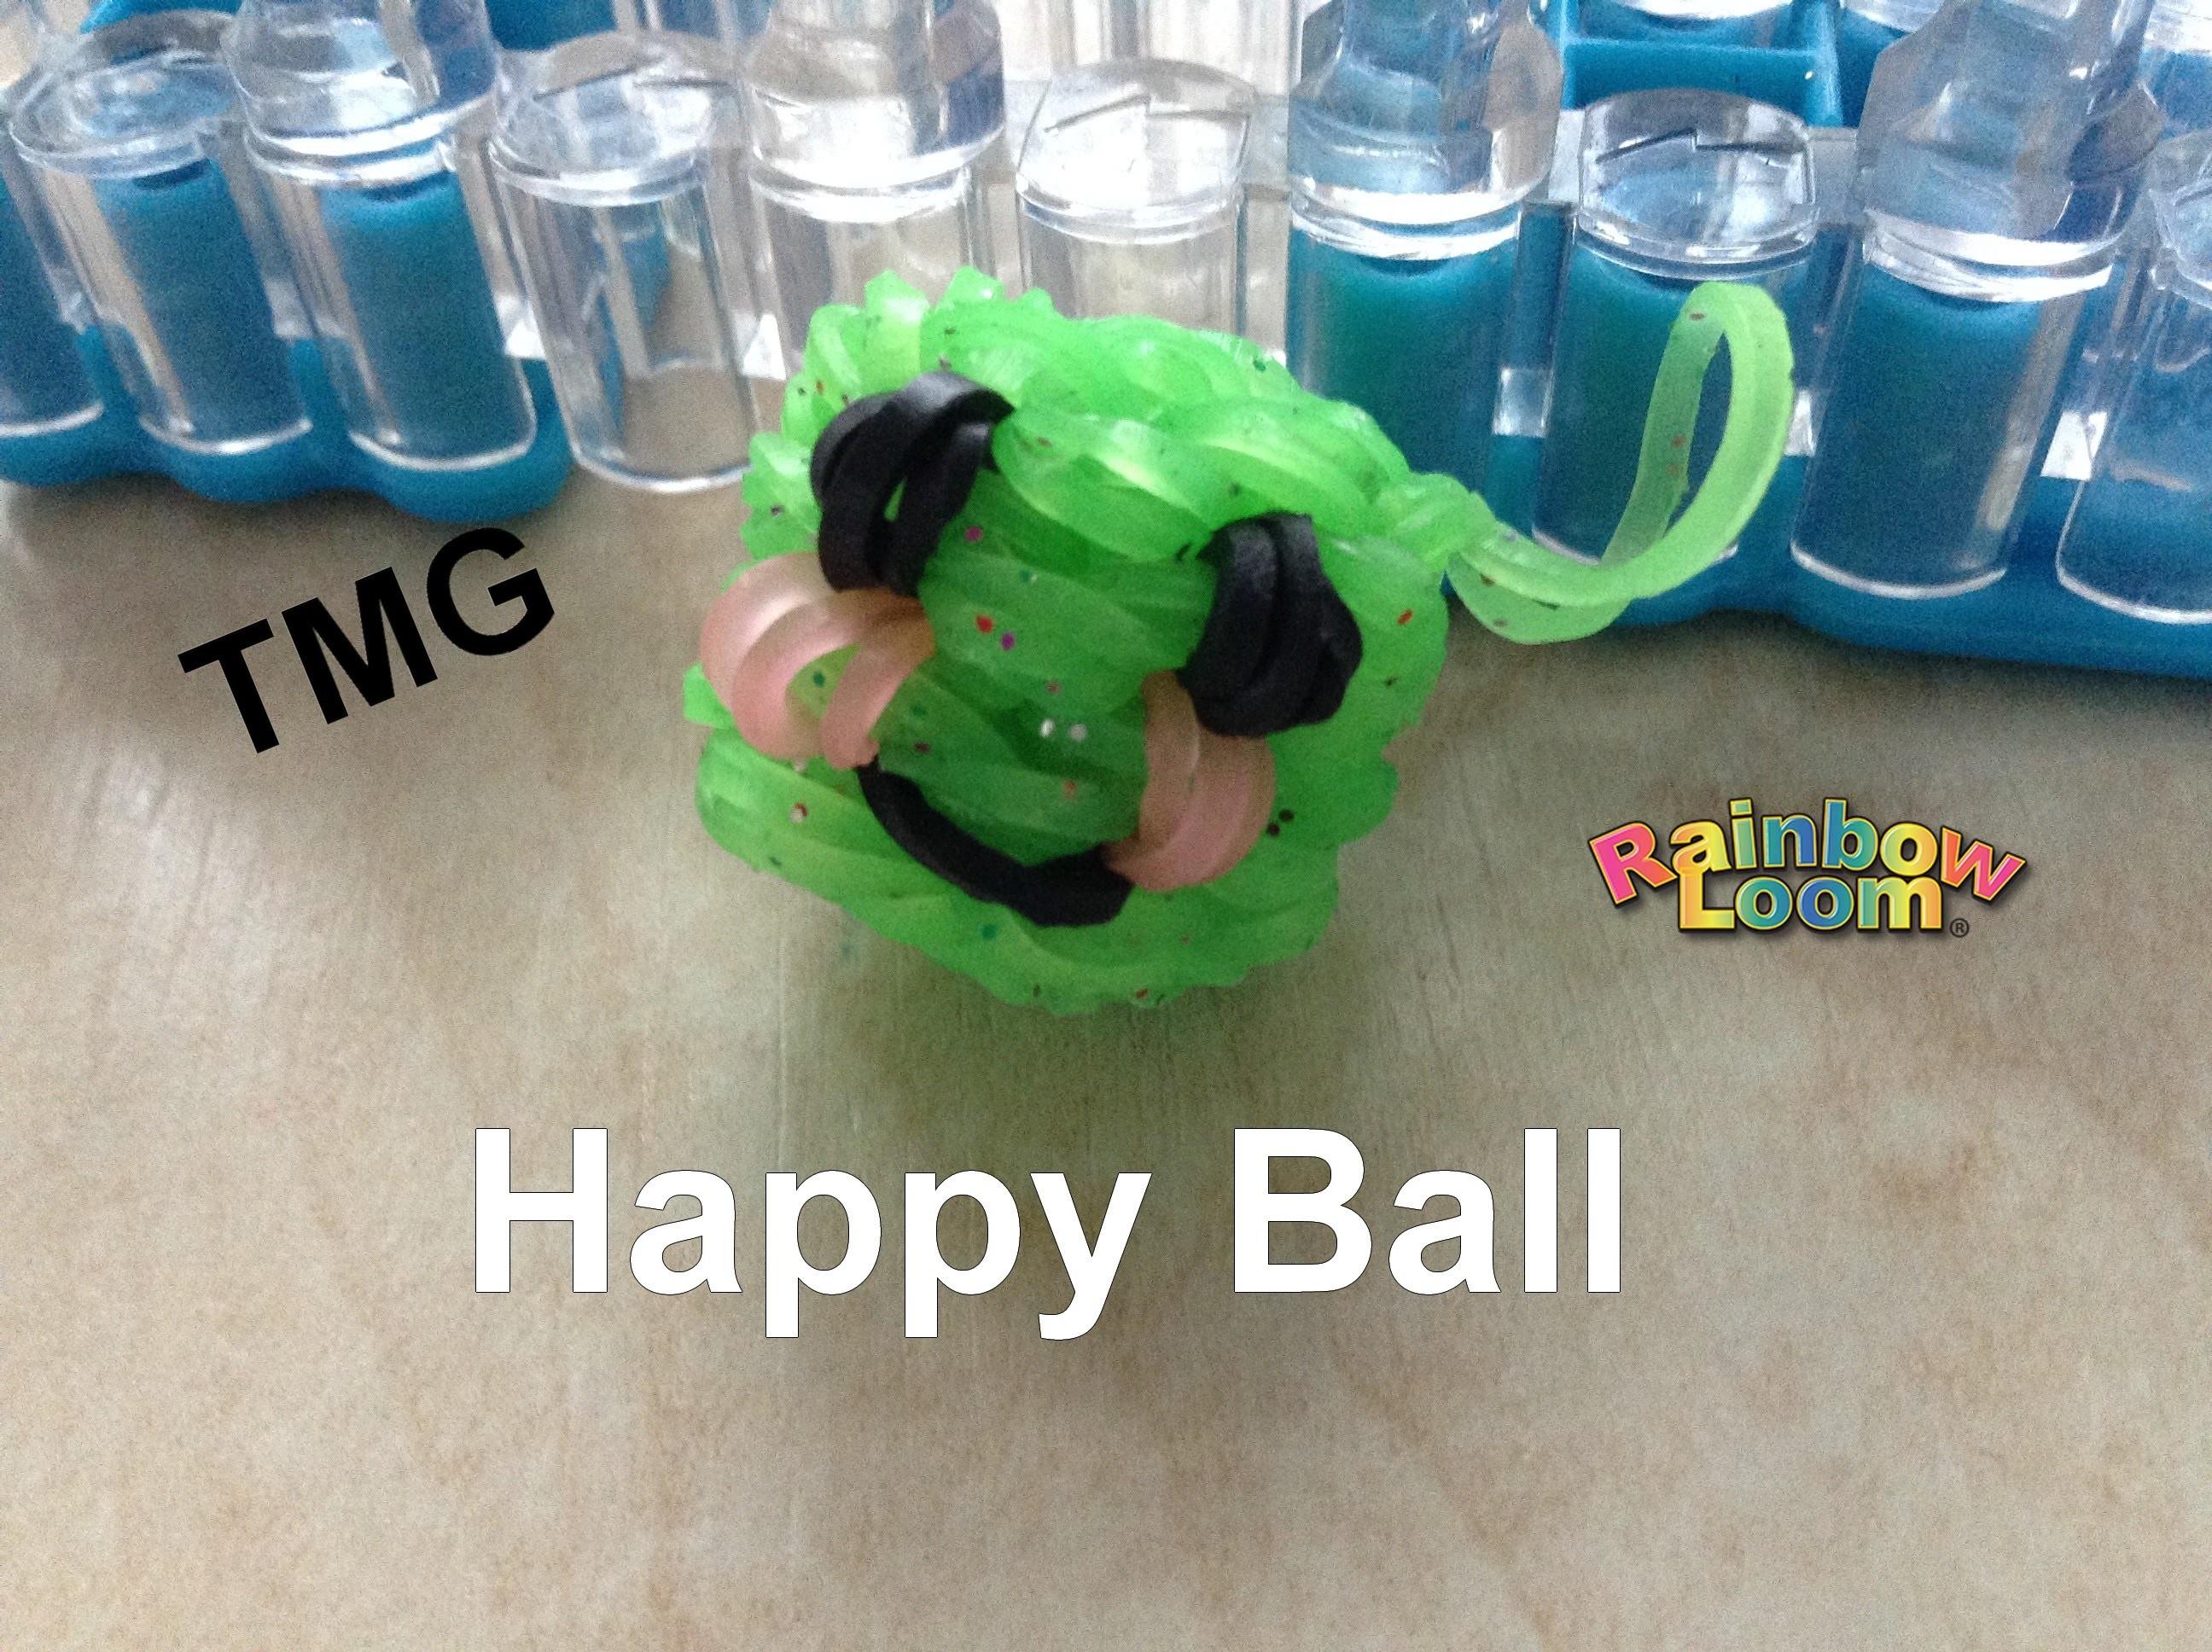 Rainbow Loom - Happy Ball - Ája